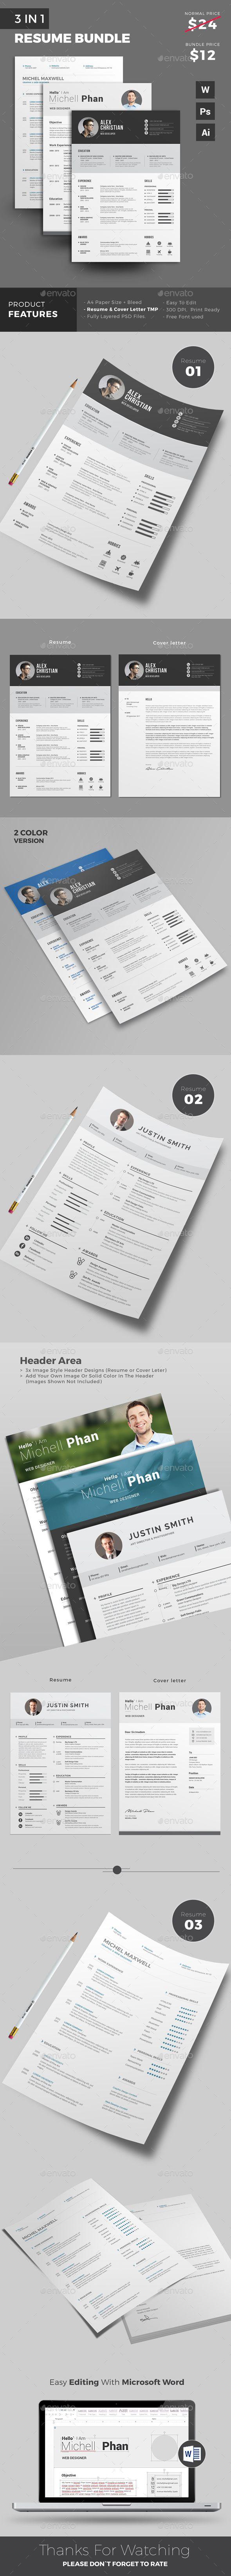 57 best Print | CV Resume images on Pinterest | Resume, Curriculum ...